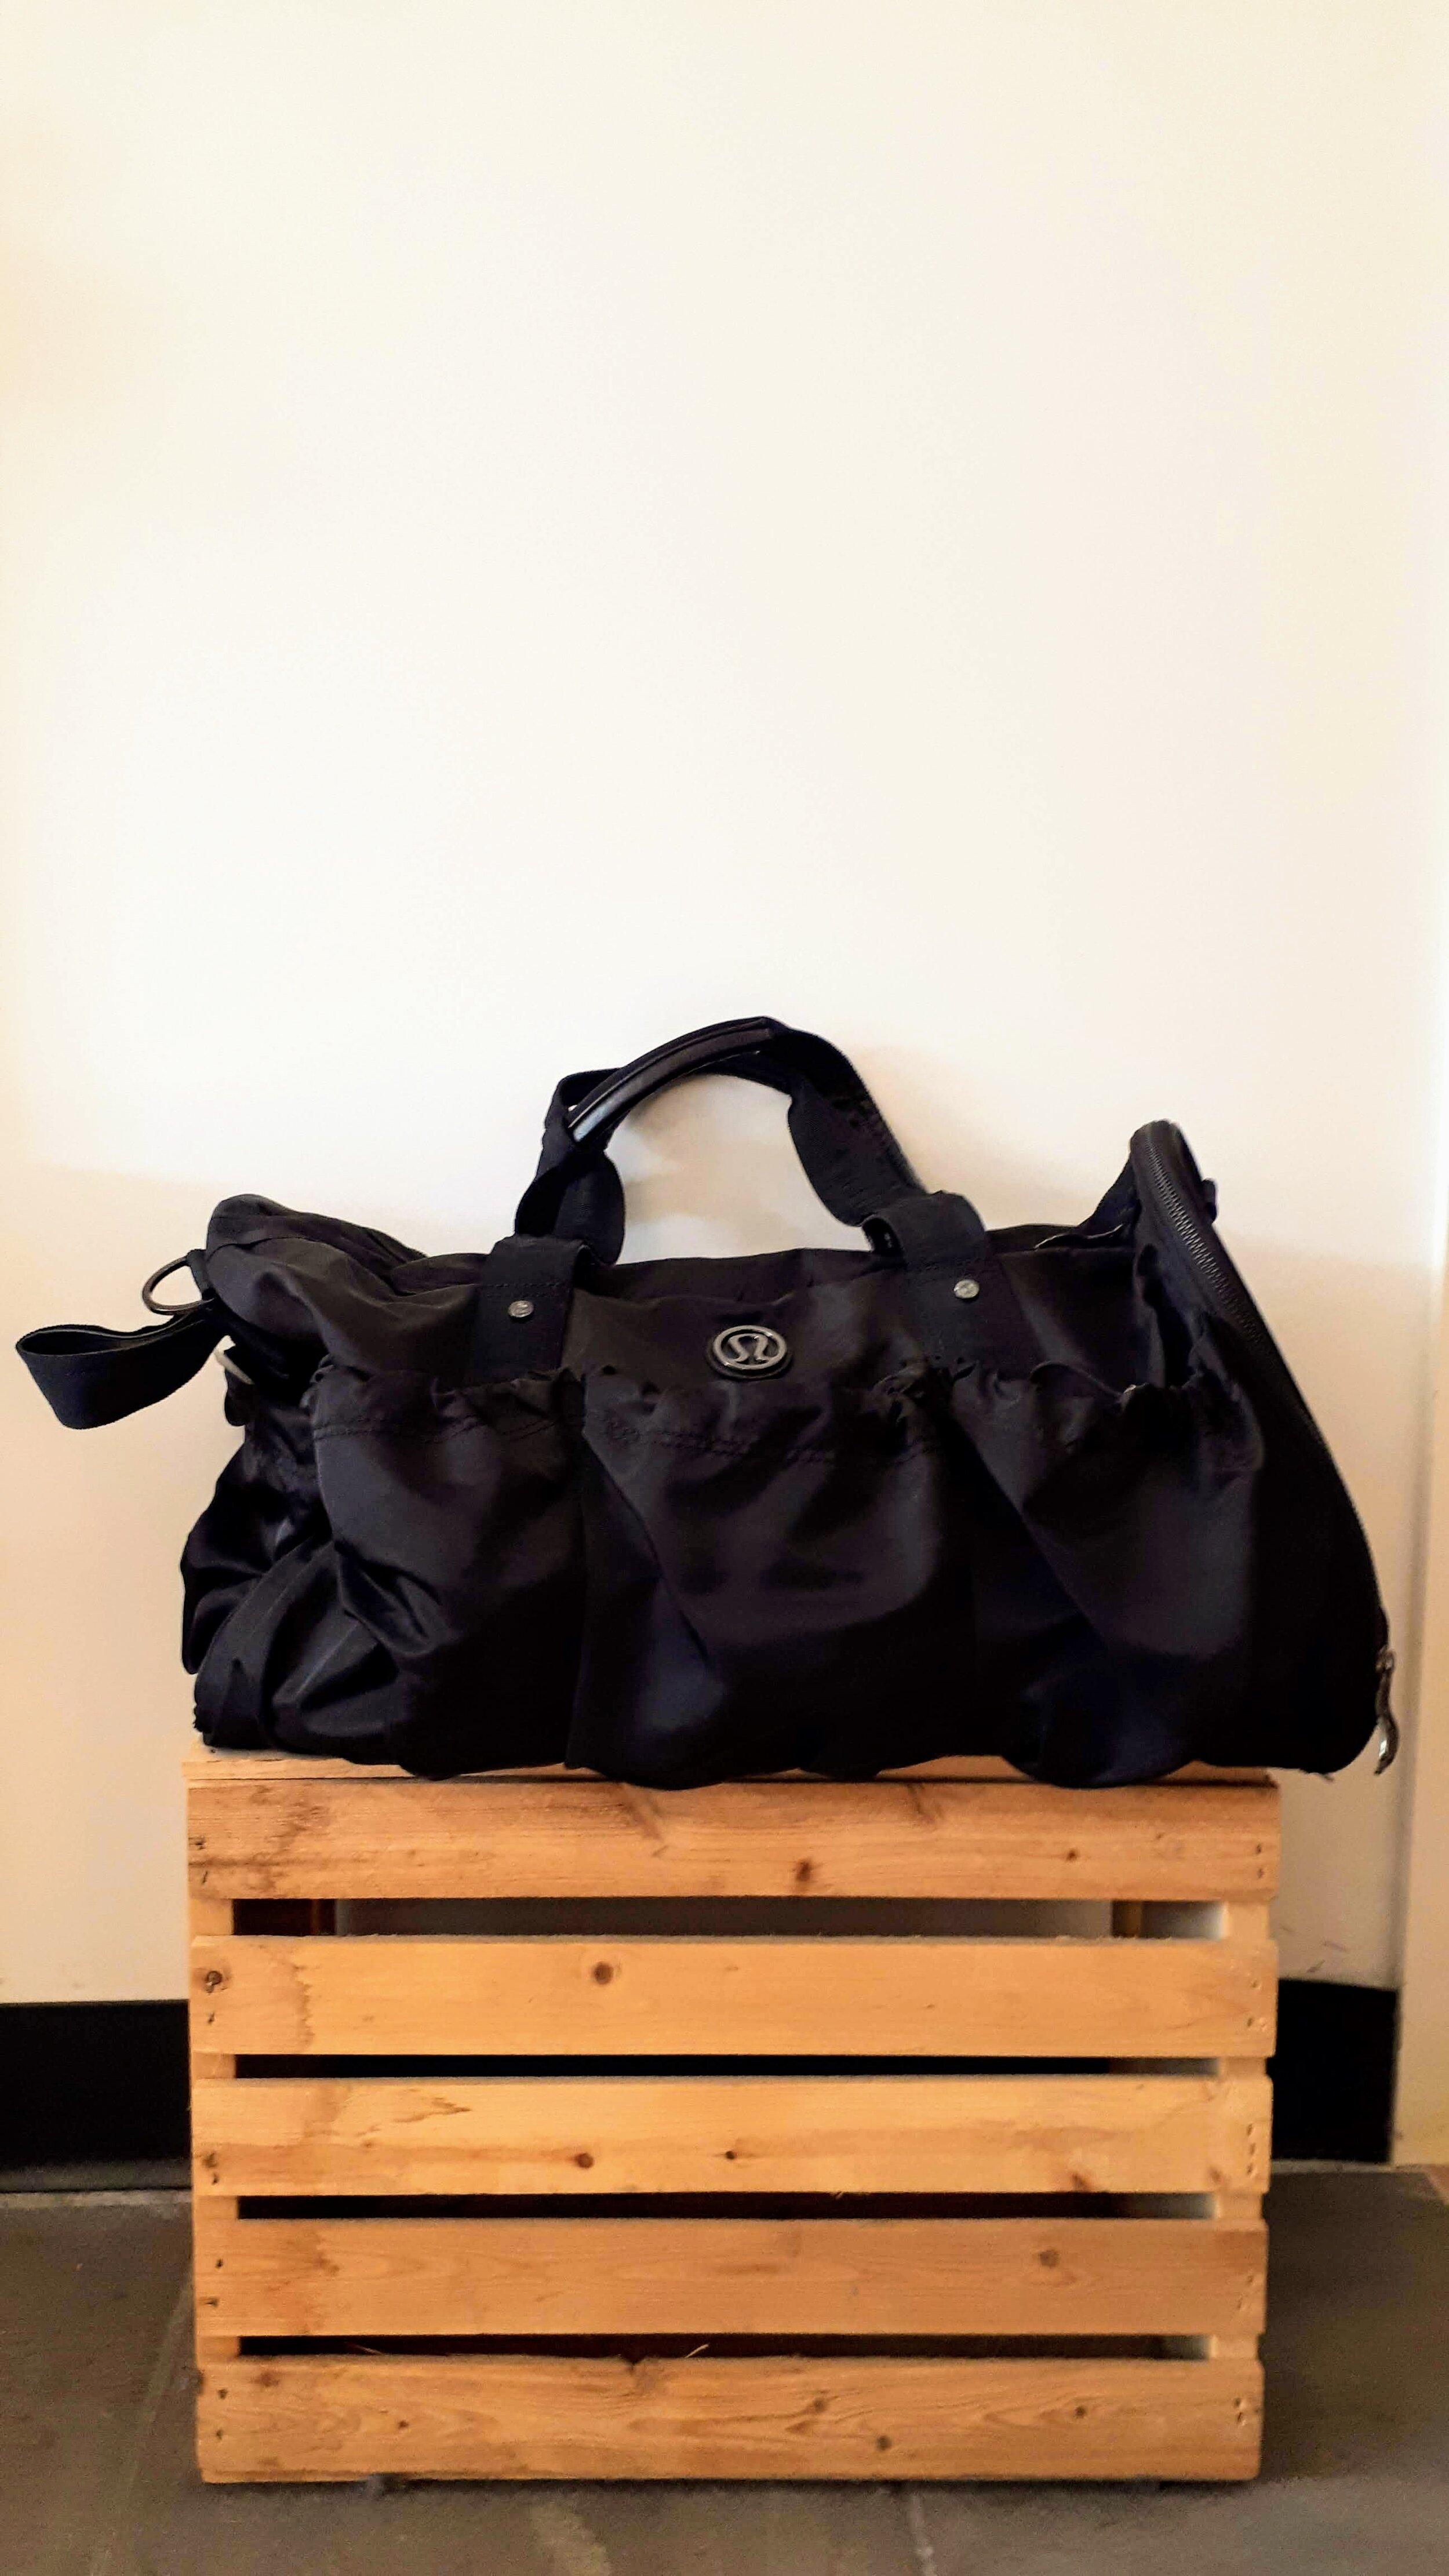 Lululemon bag, $62